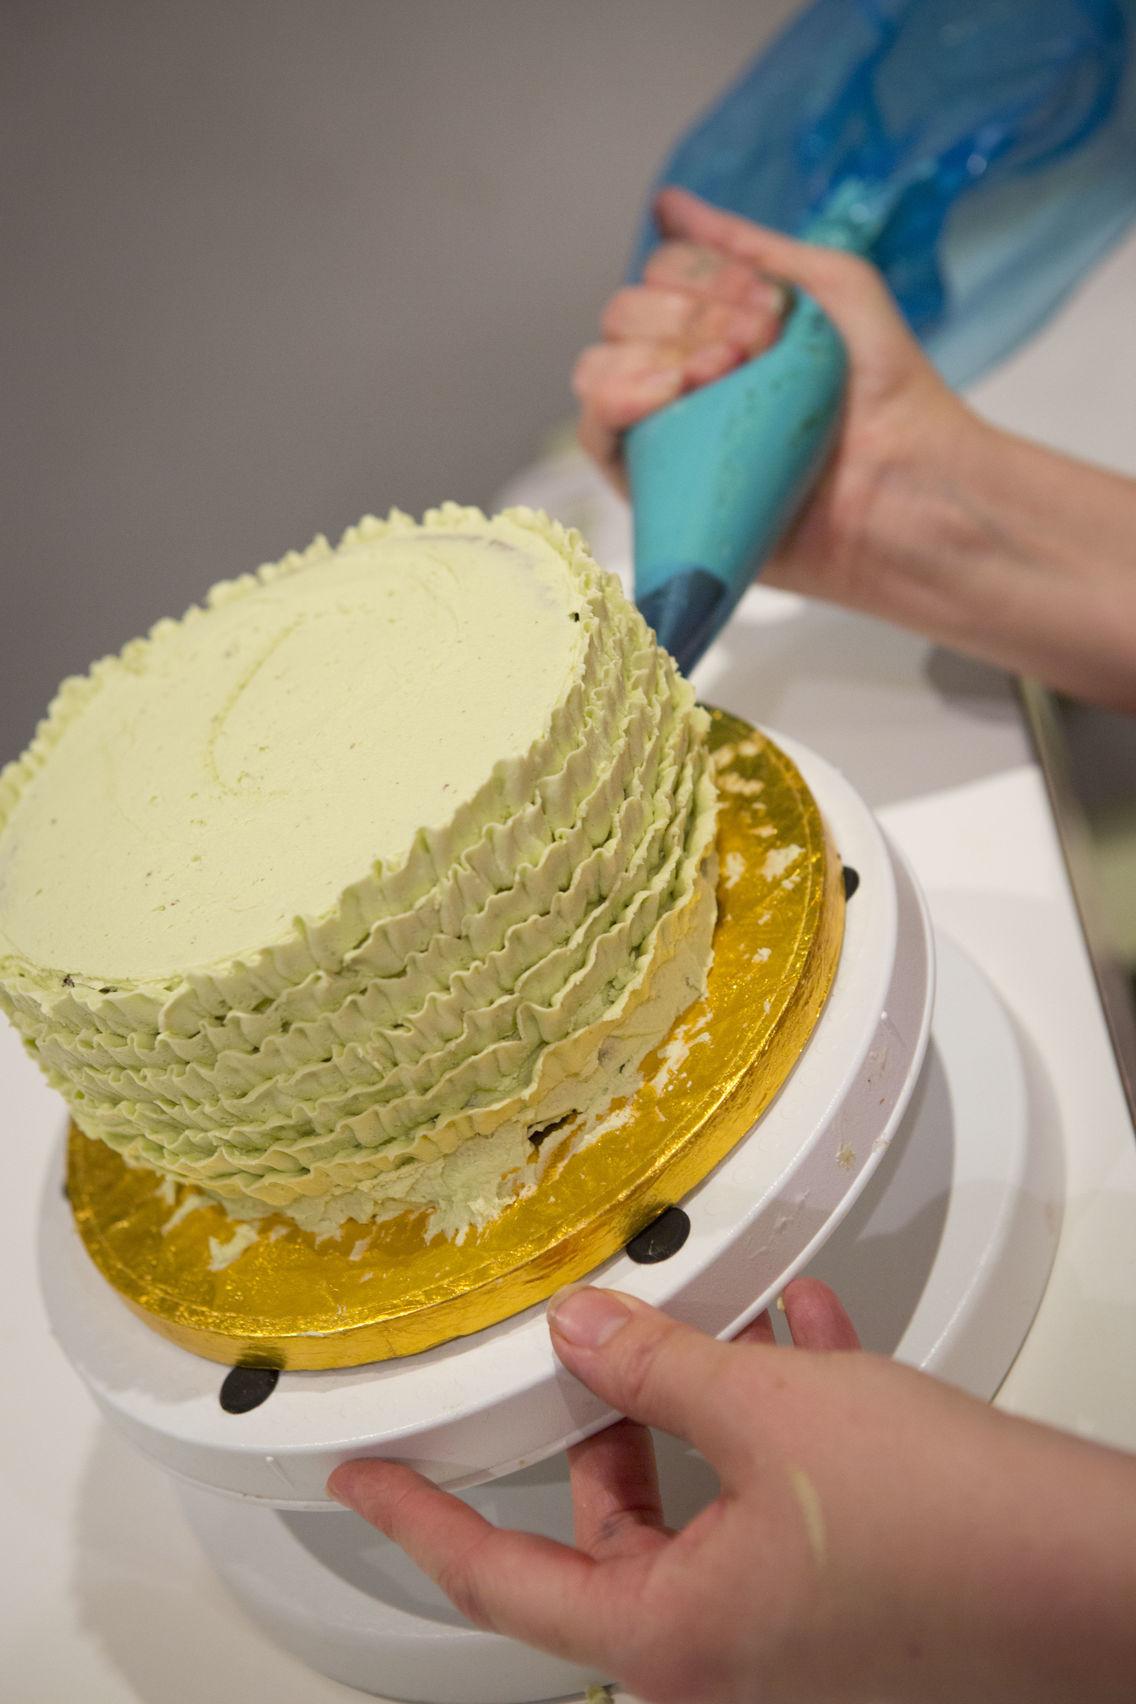 Cake Baking Workshop, Cookie Girl Studio Kitchen